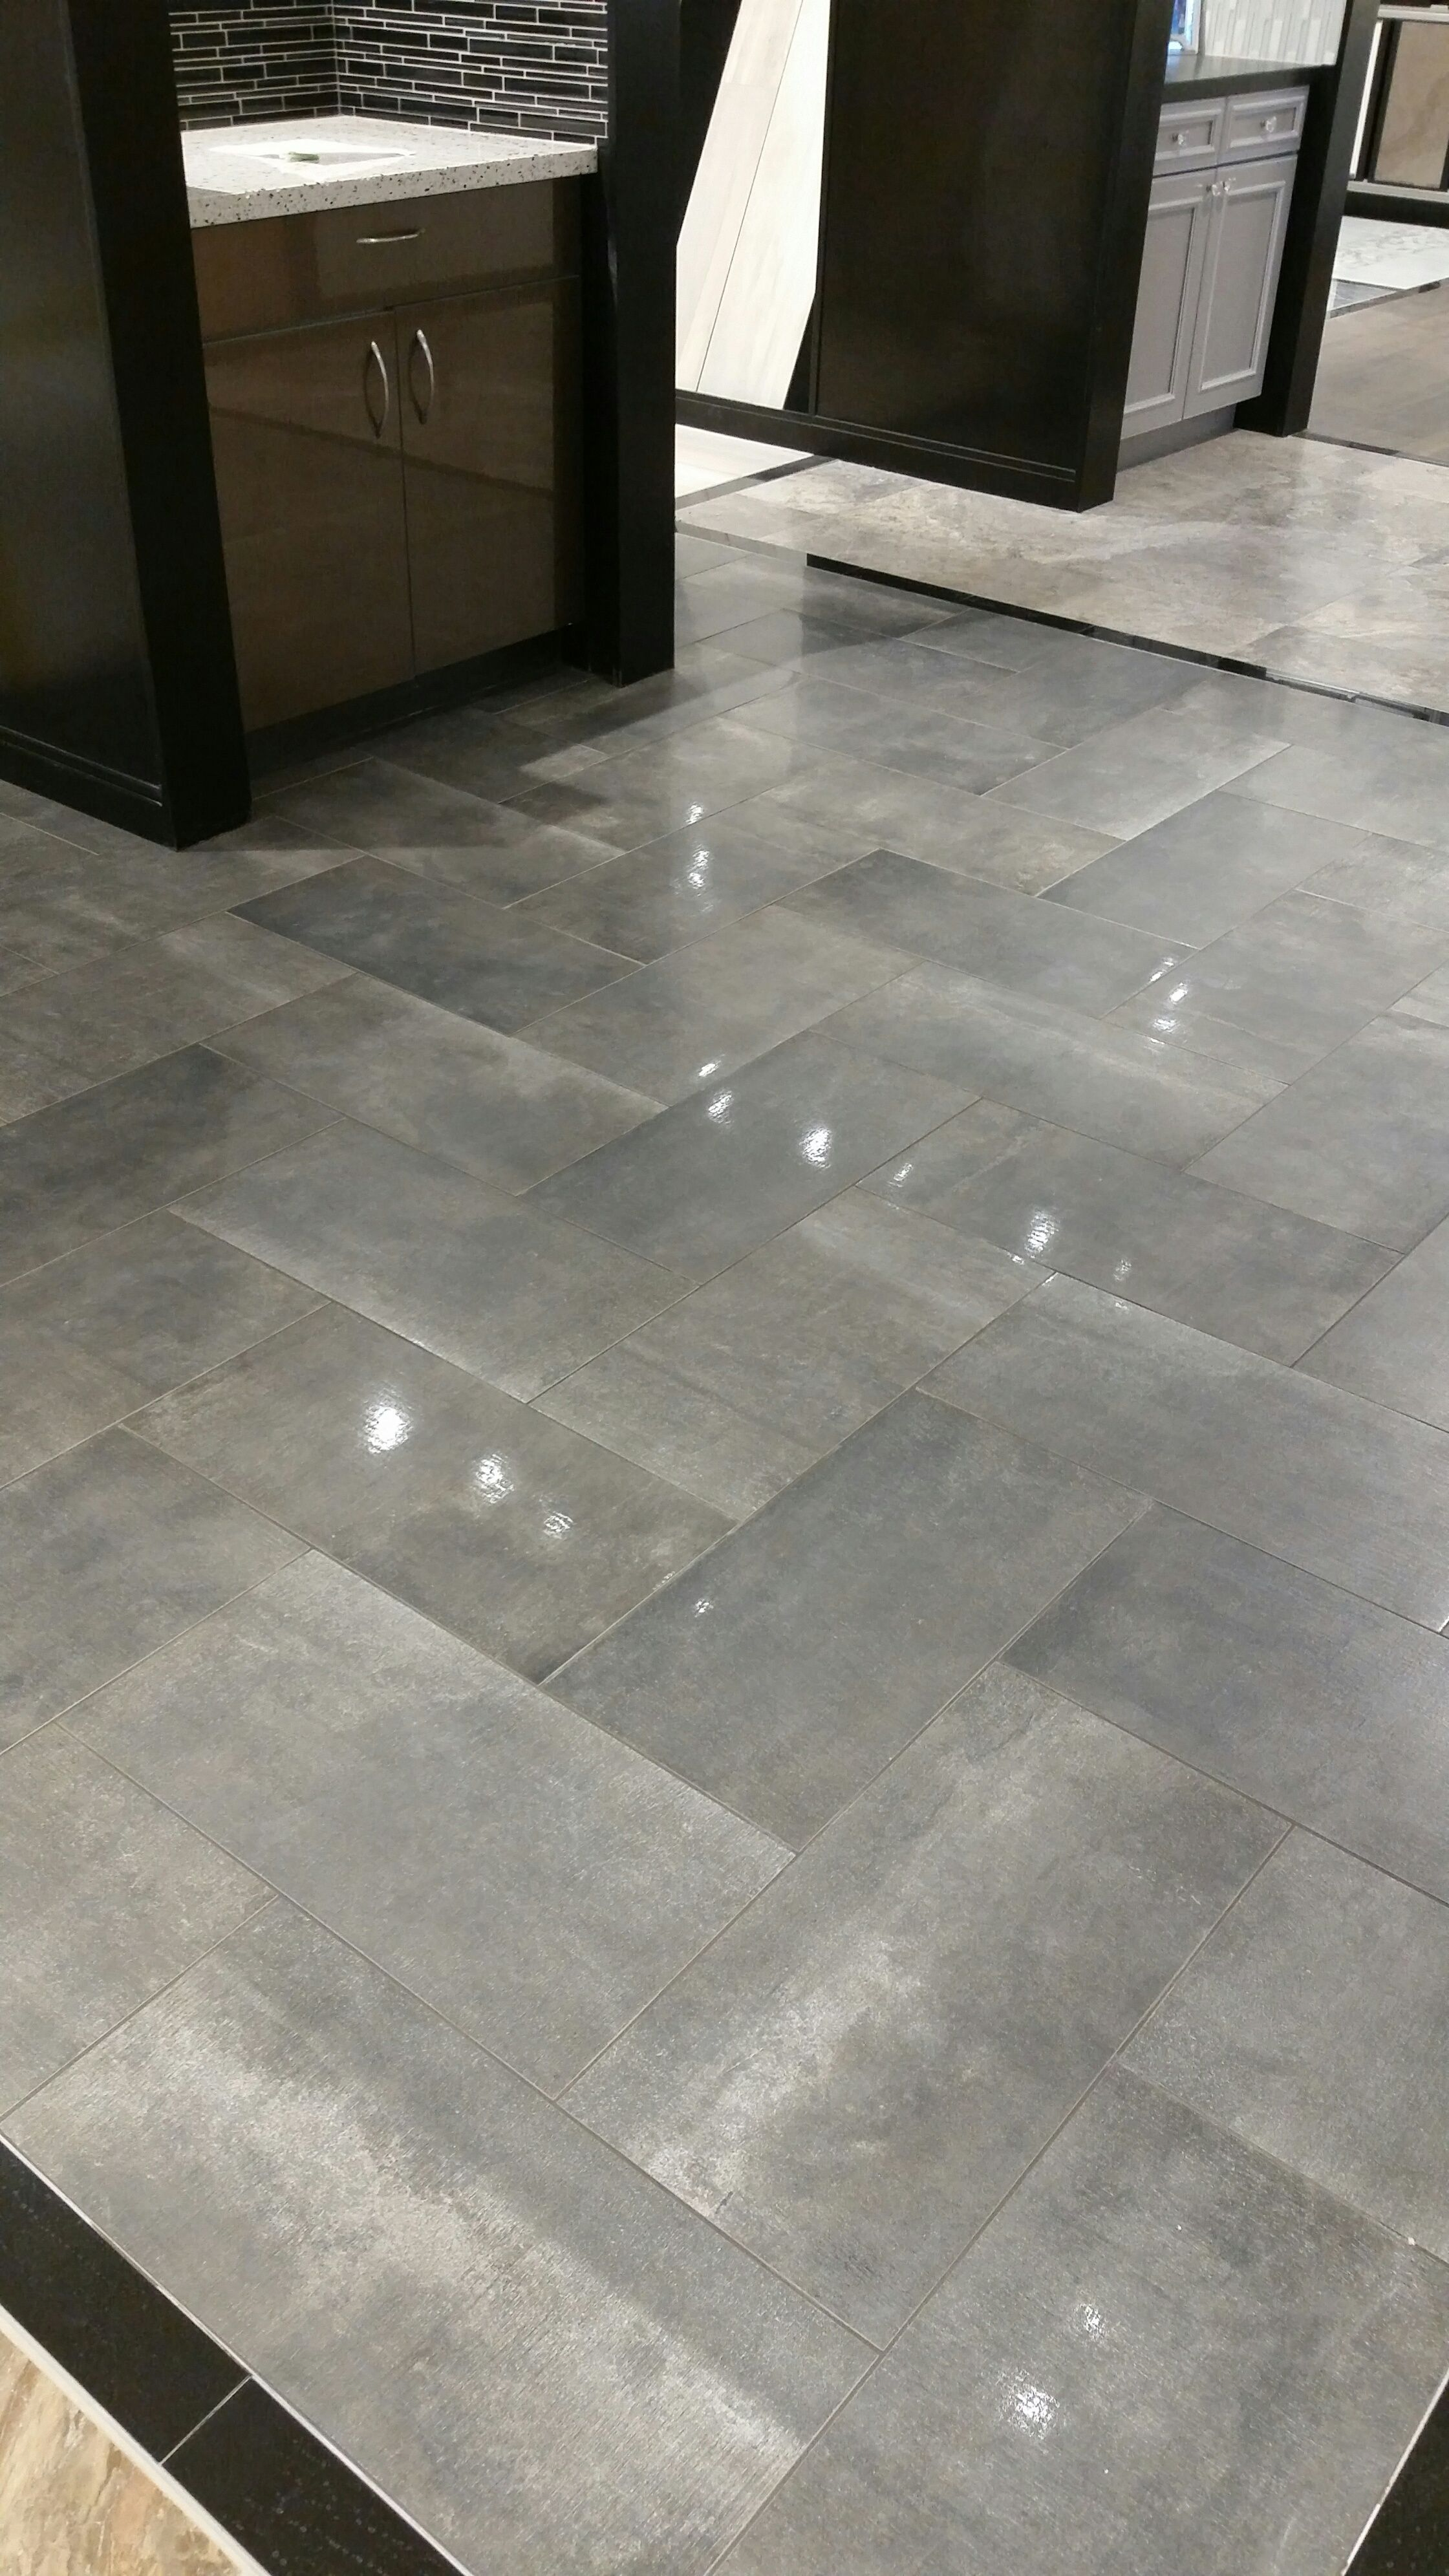 sav wood glazed porcelain tile | arizona tile | kitchen remodel